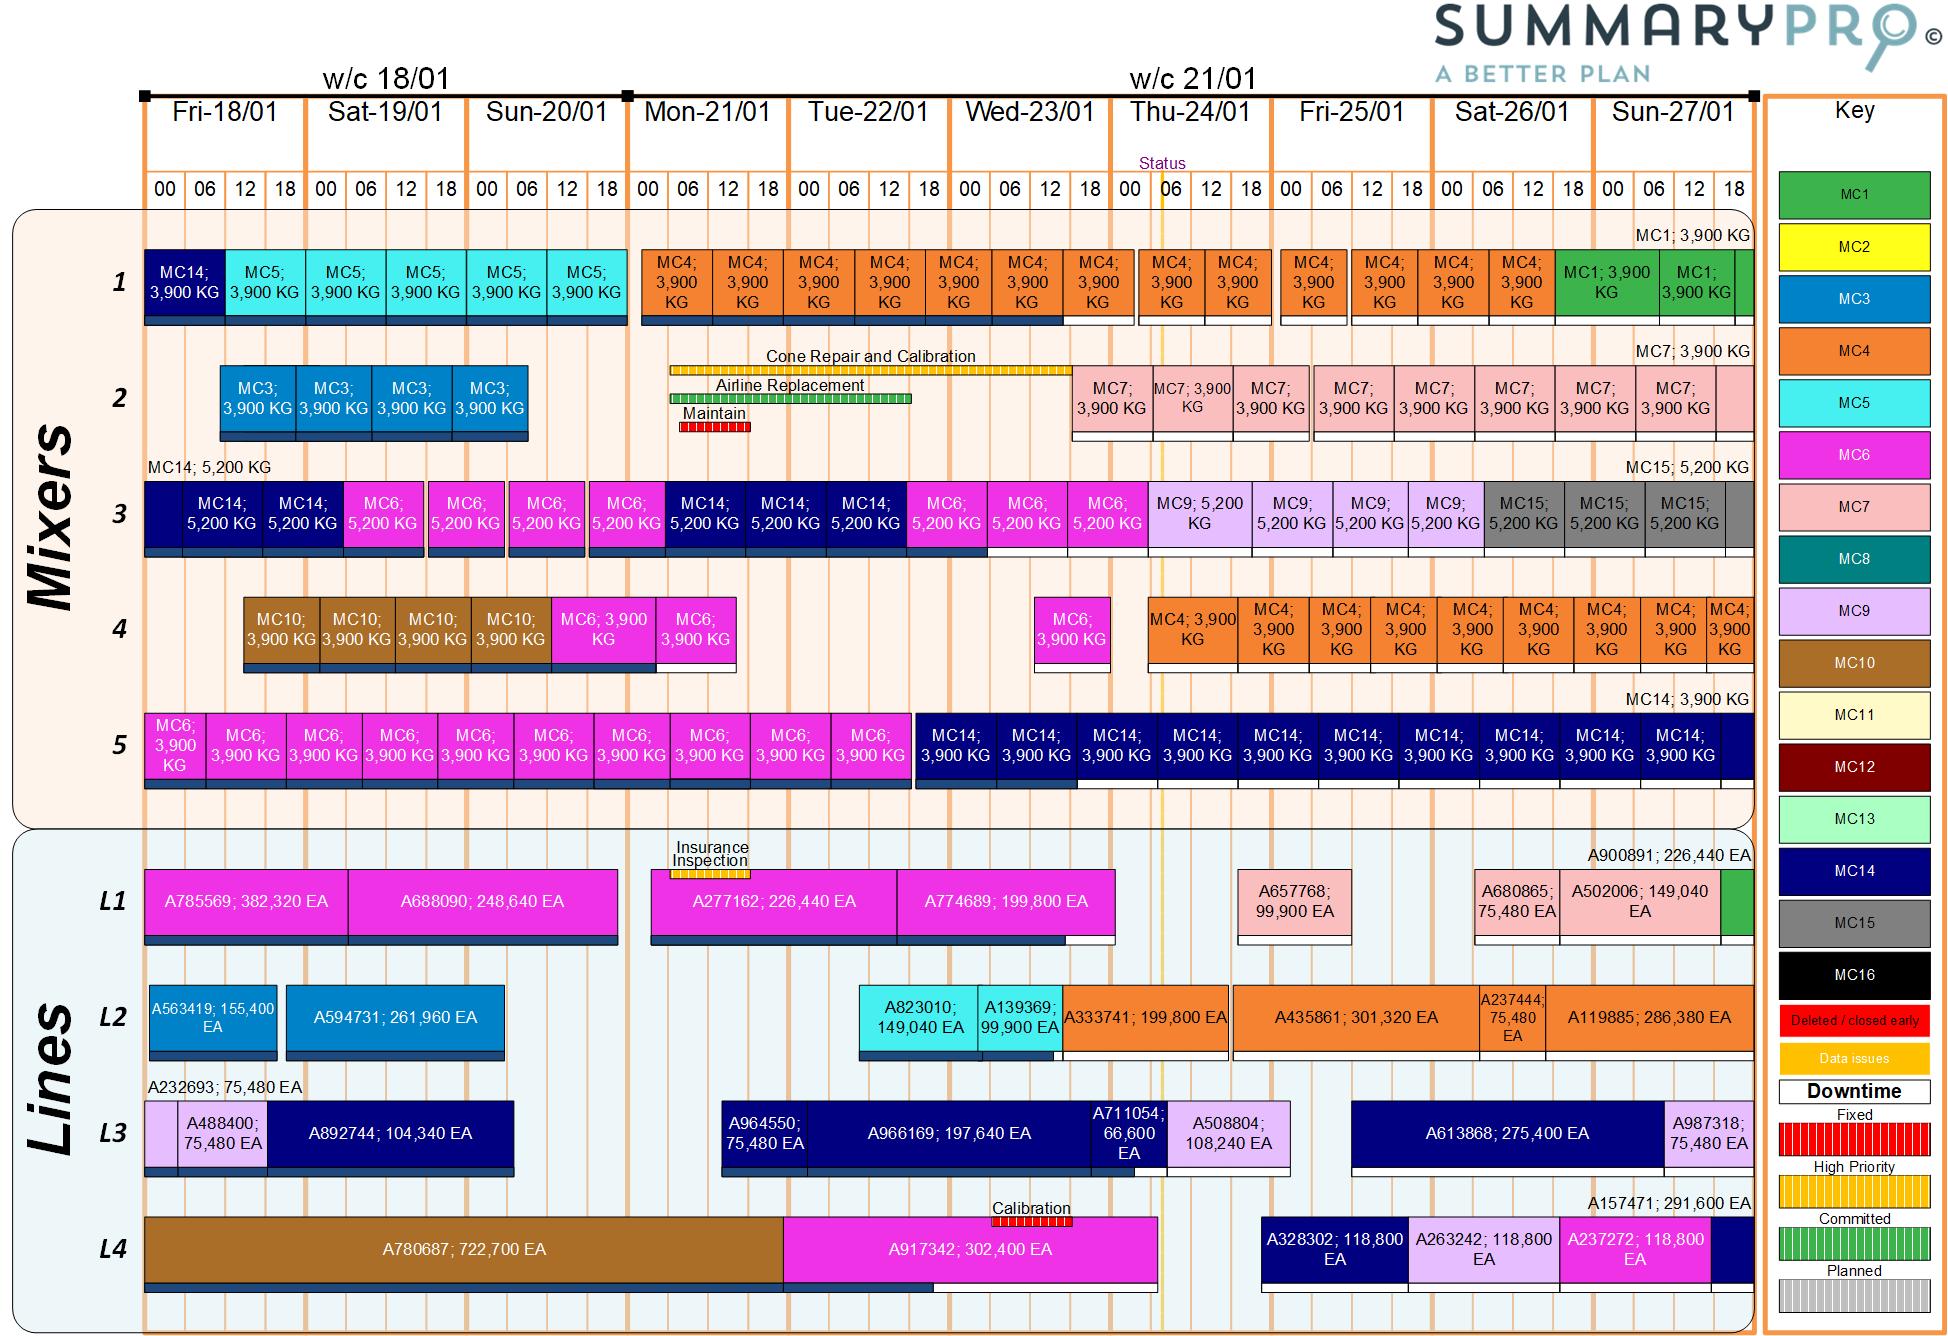 SummaryPro production summary including downtime